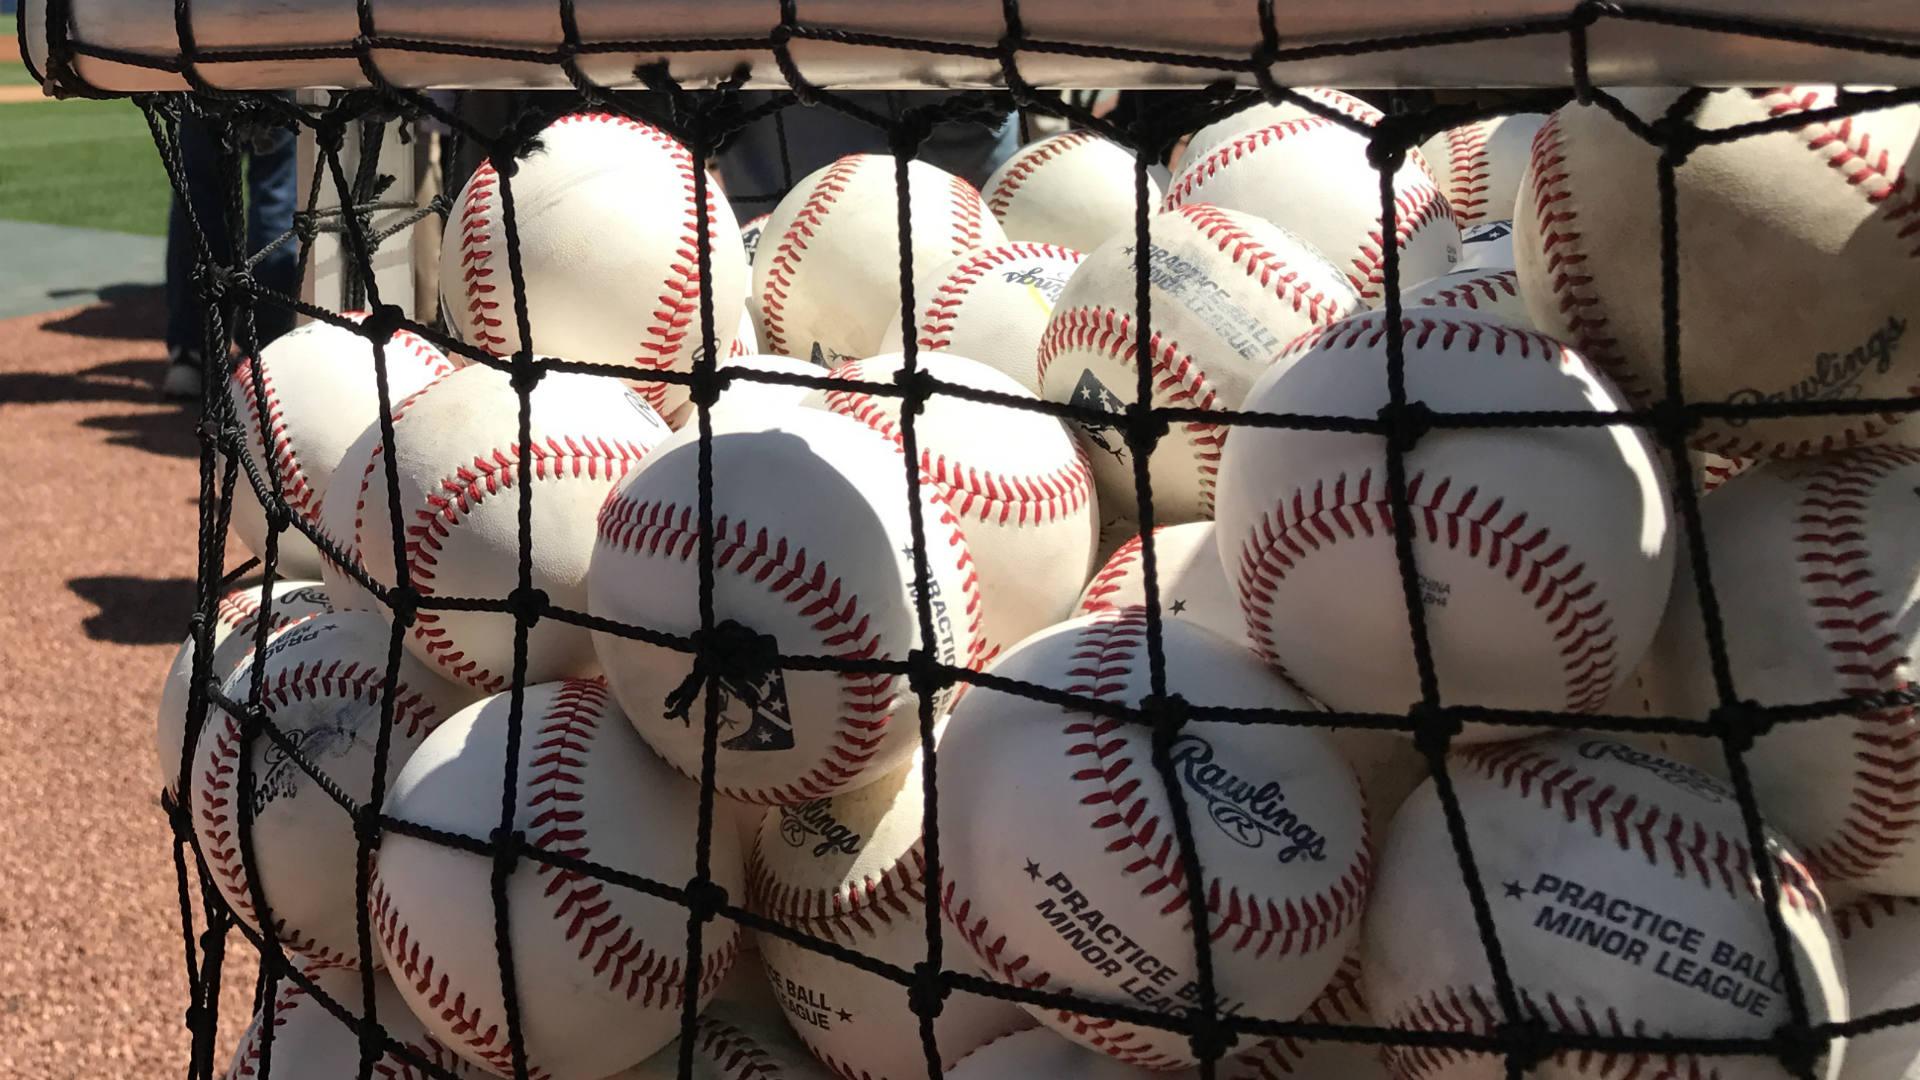 Minor-league-baseballs-031418-ftr-snjpg_opi2v333keyj1kosv6c6s2sjd